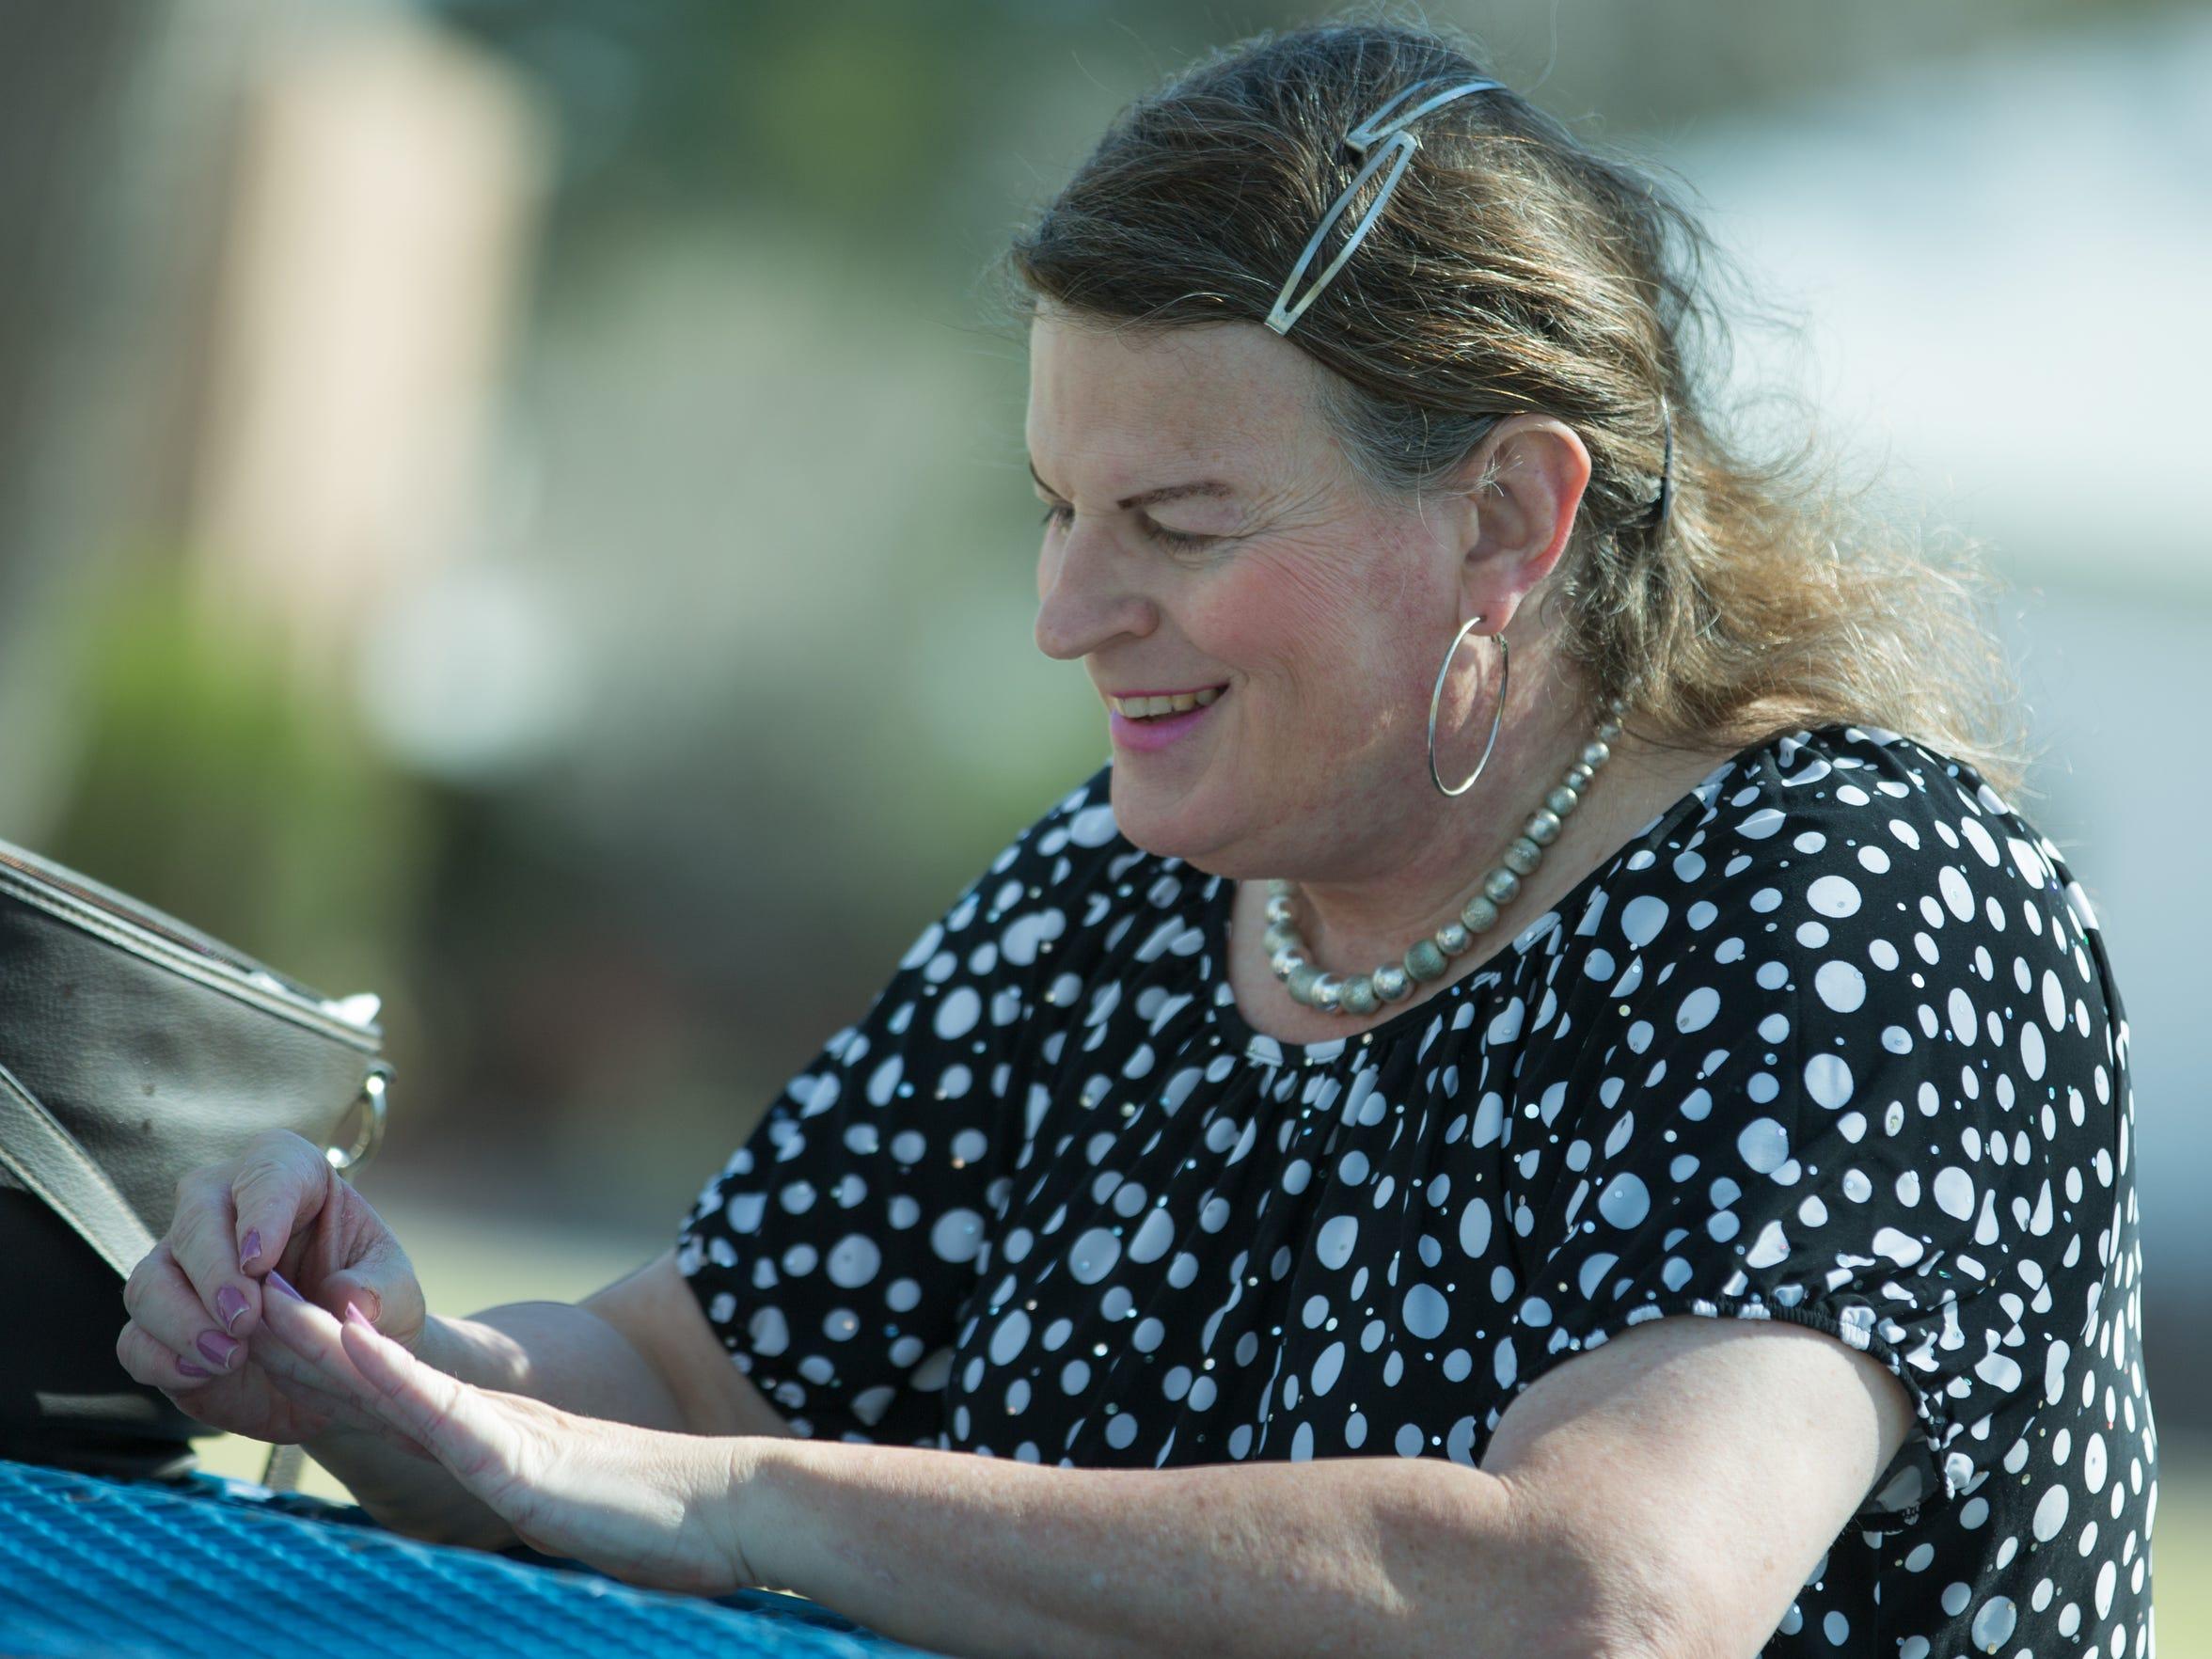 Jodi Wenneborg, 52, a transgender woman, looks at her